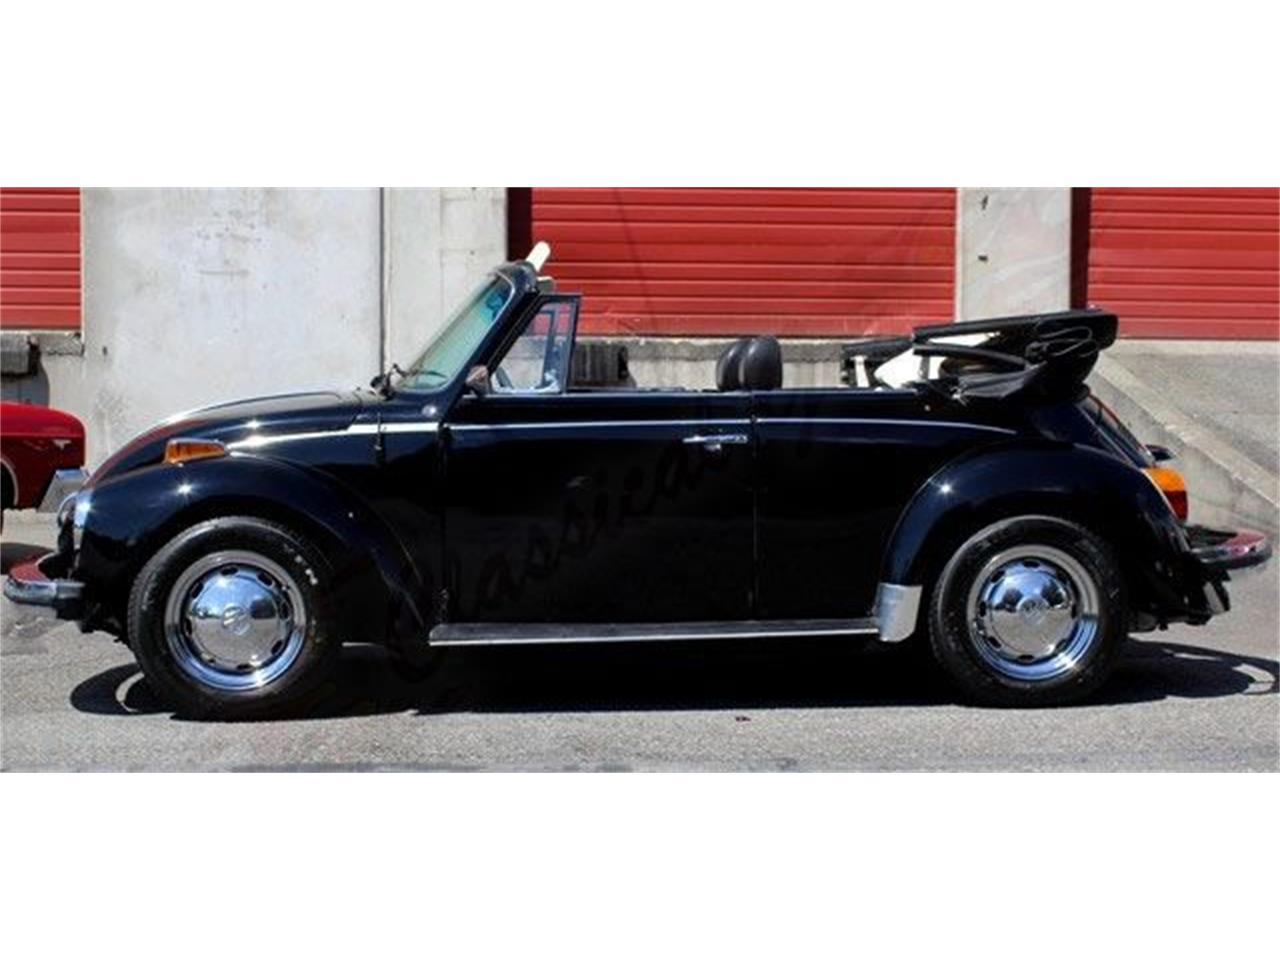 Large Picture of '79 Volkswagen Beetle - J4TV